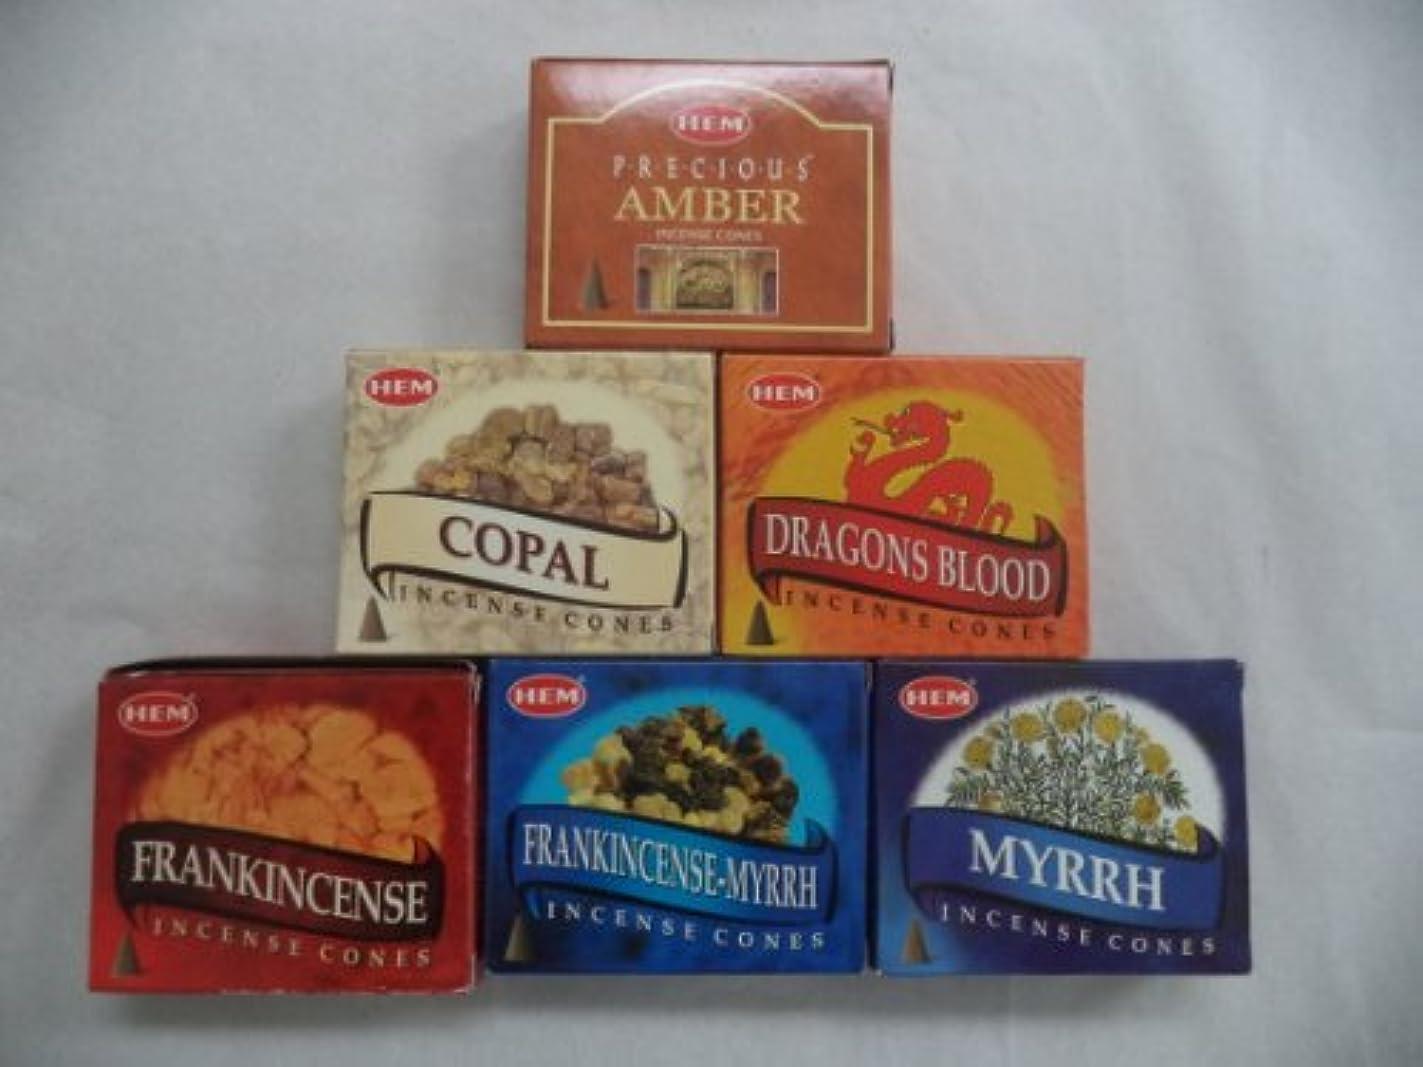 Hem Traditional Resin Sampler Incense Cones, 6 Packs of 10 Cones = 60 Cones by Hem